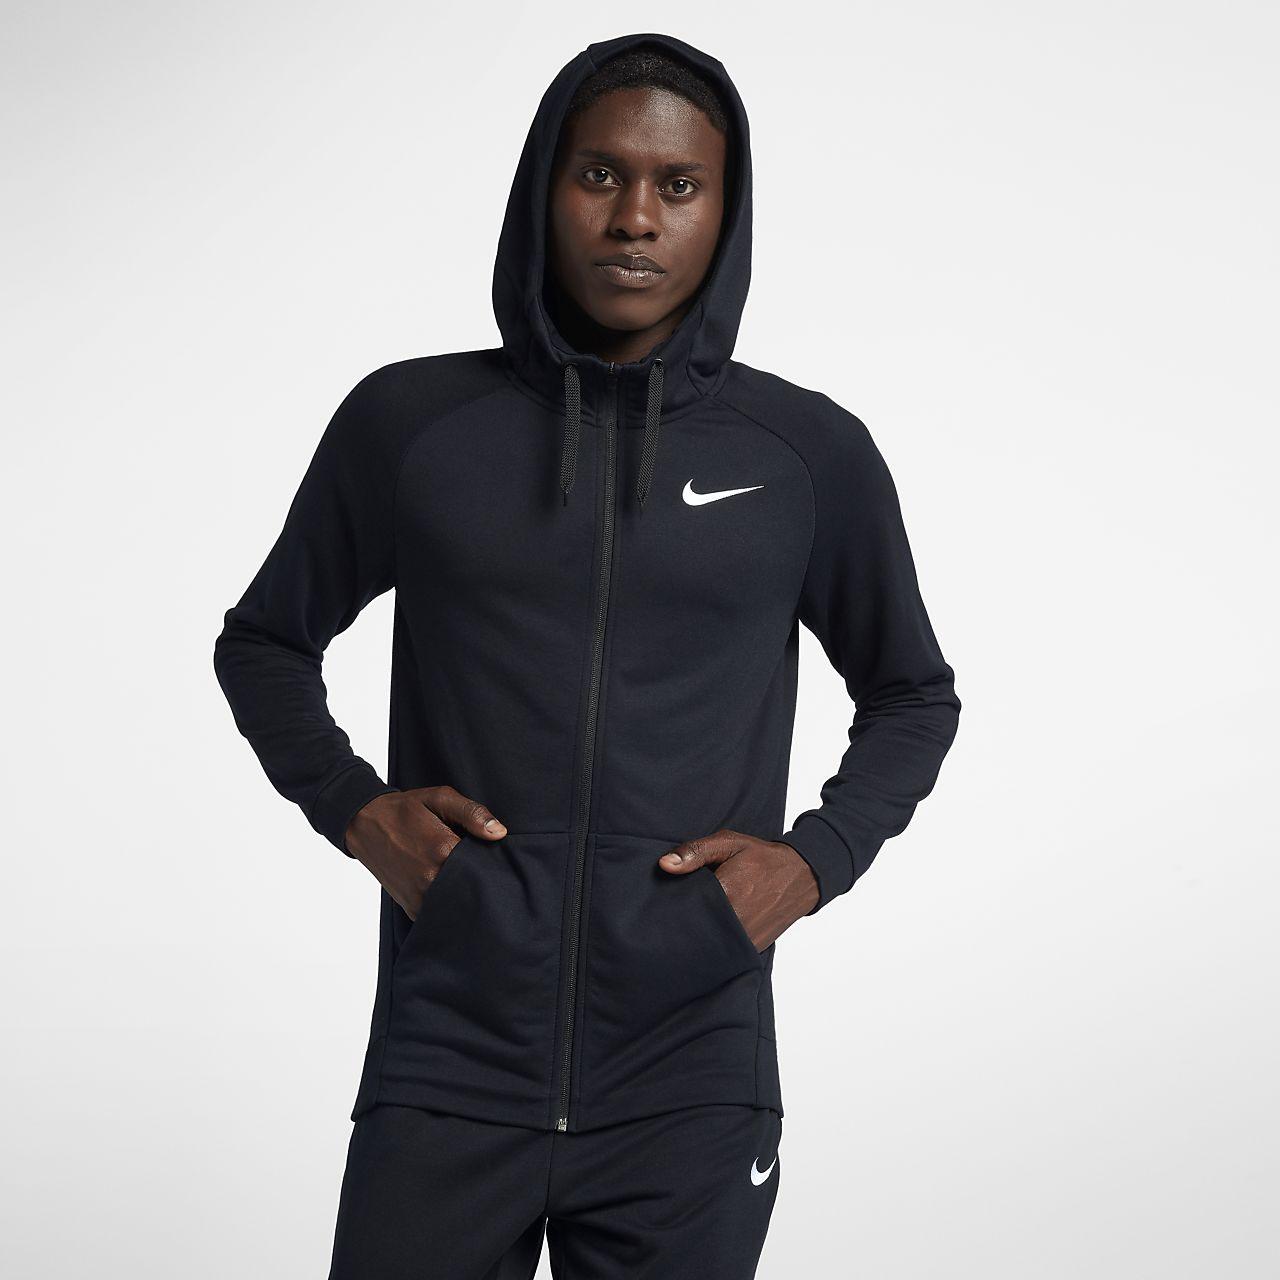 0a234466a6d5 Nike Dri-FIT Men s Full-Zip Training Hoodie. Nike.com HU